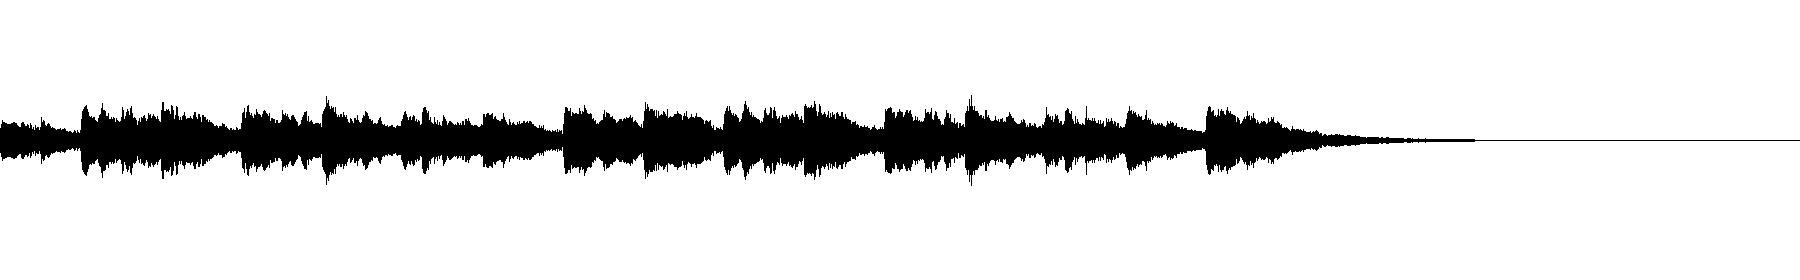 melodia assurda